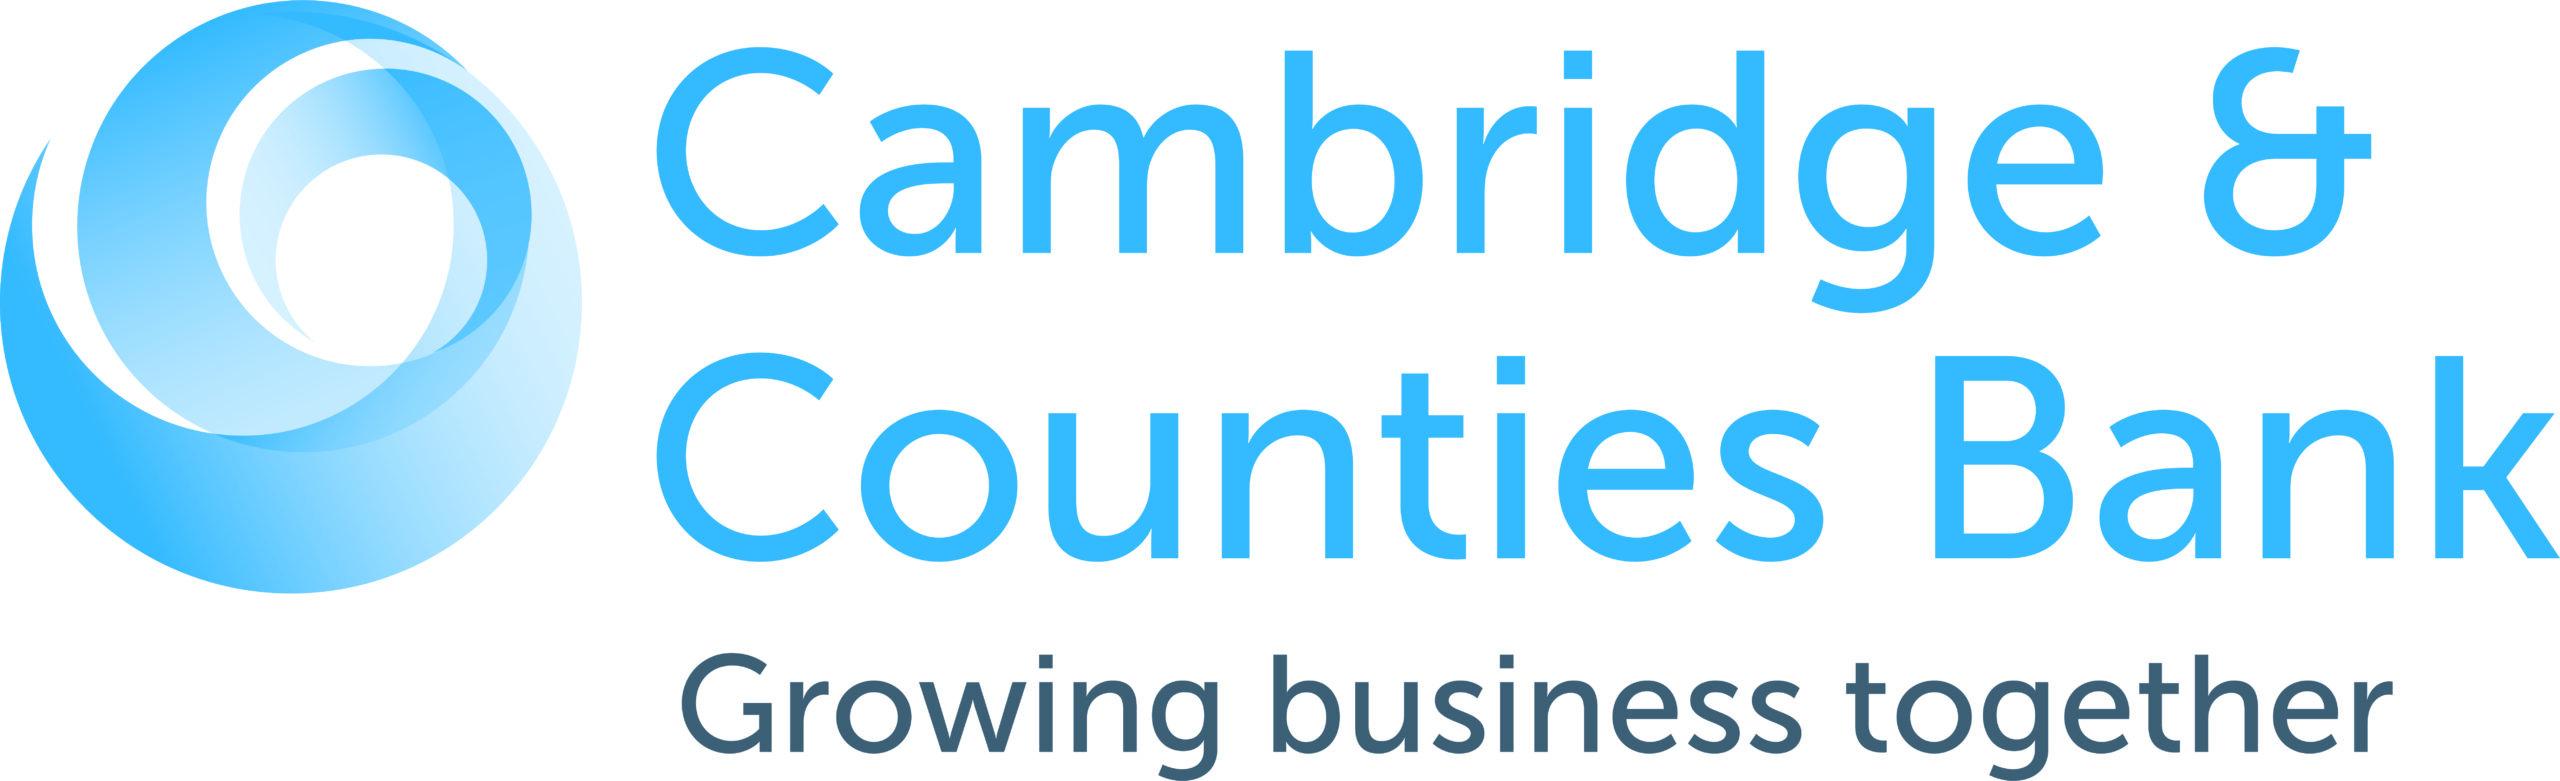 Cambridge & Counties Bank logo